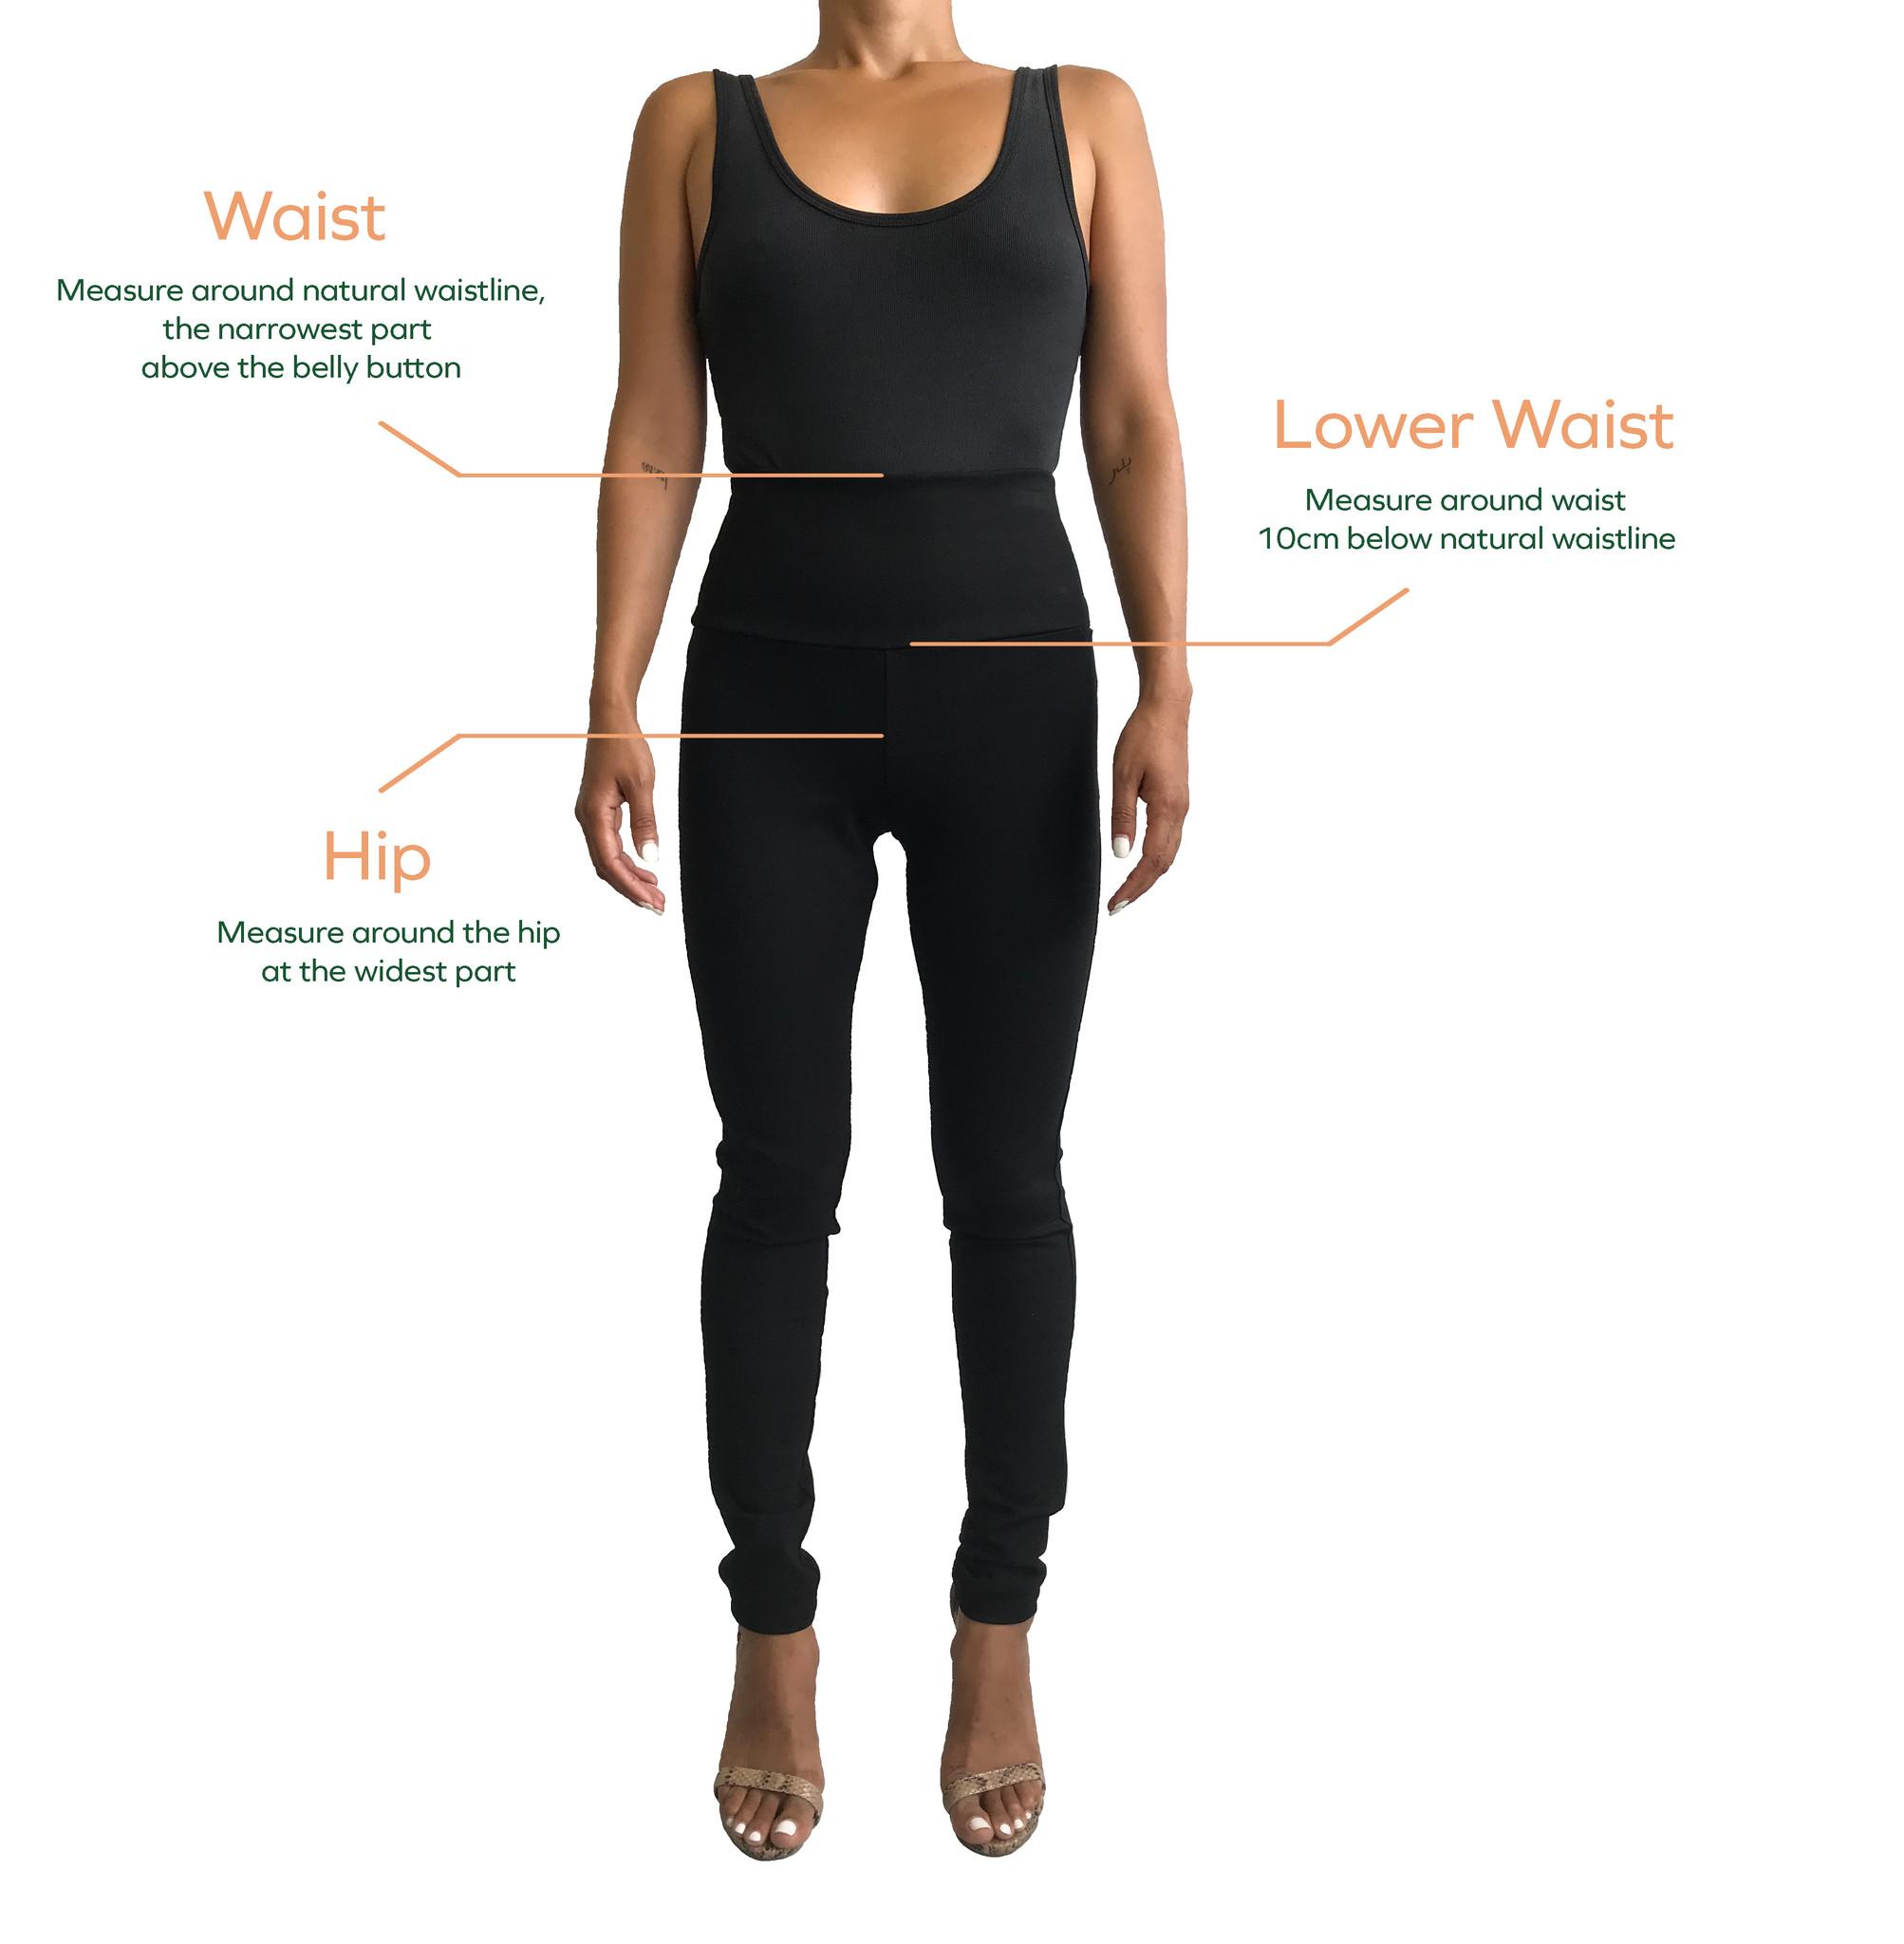 Full Body Measurements